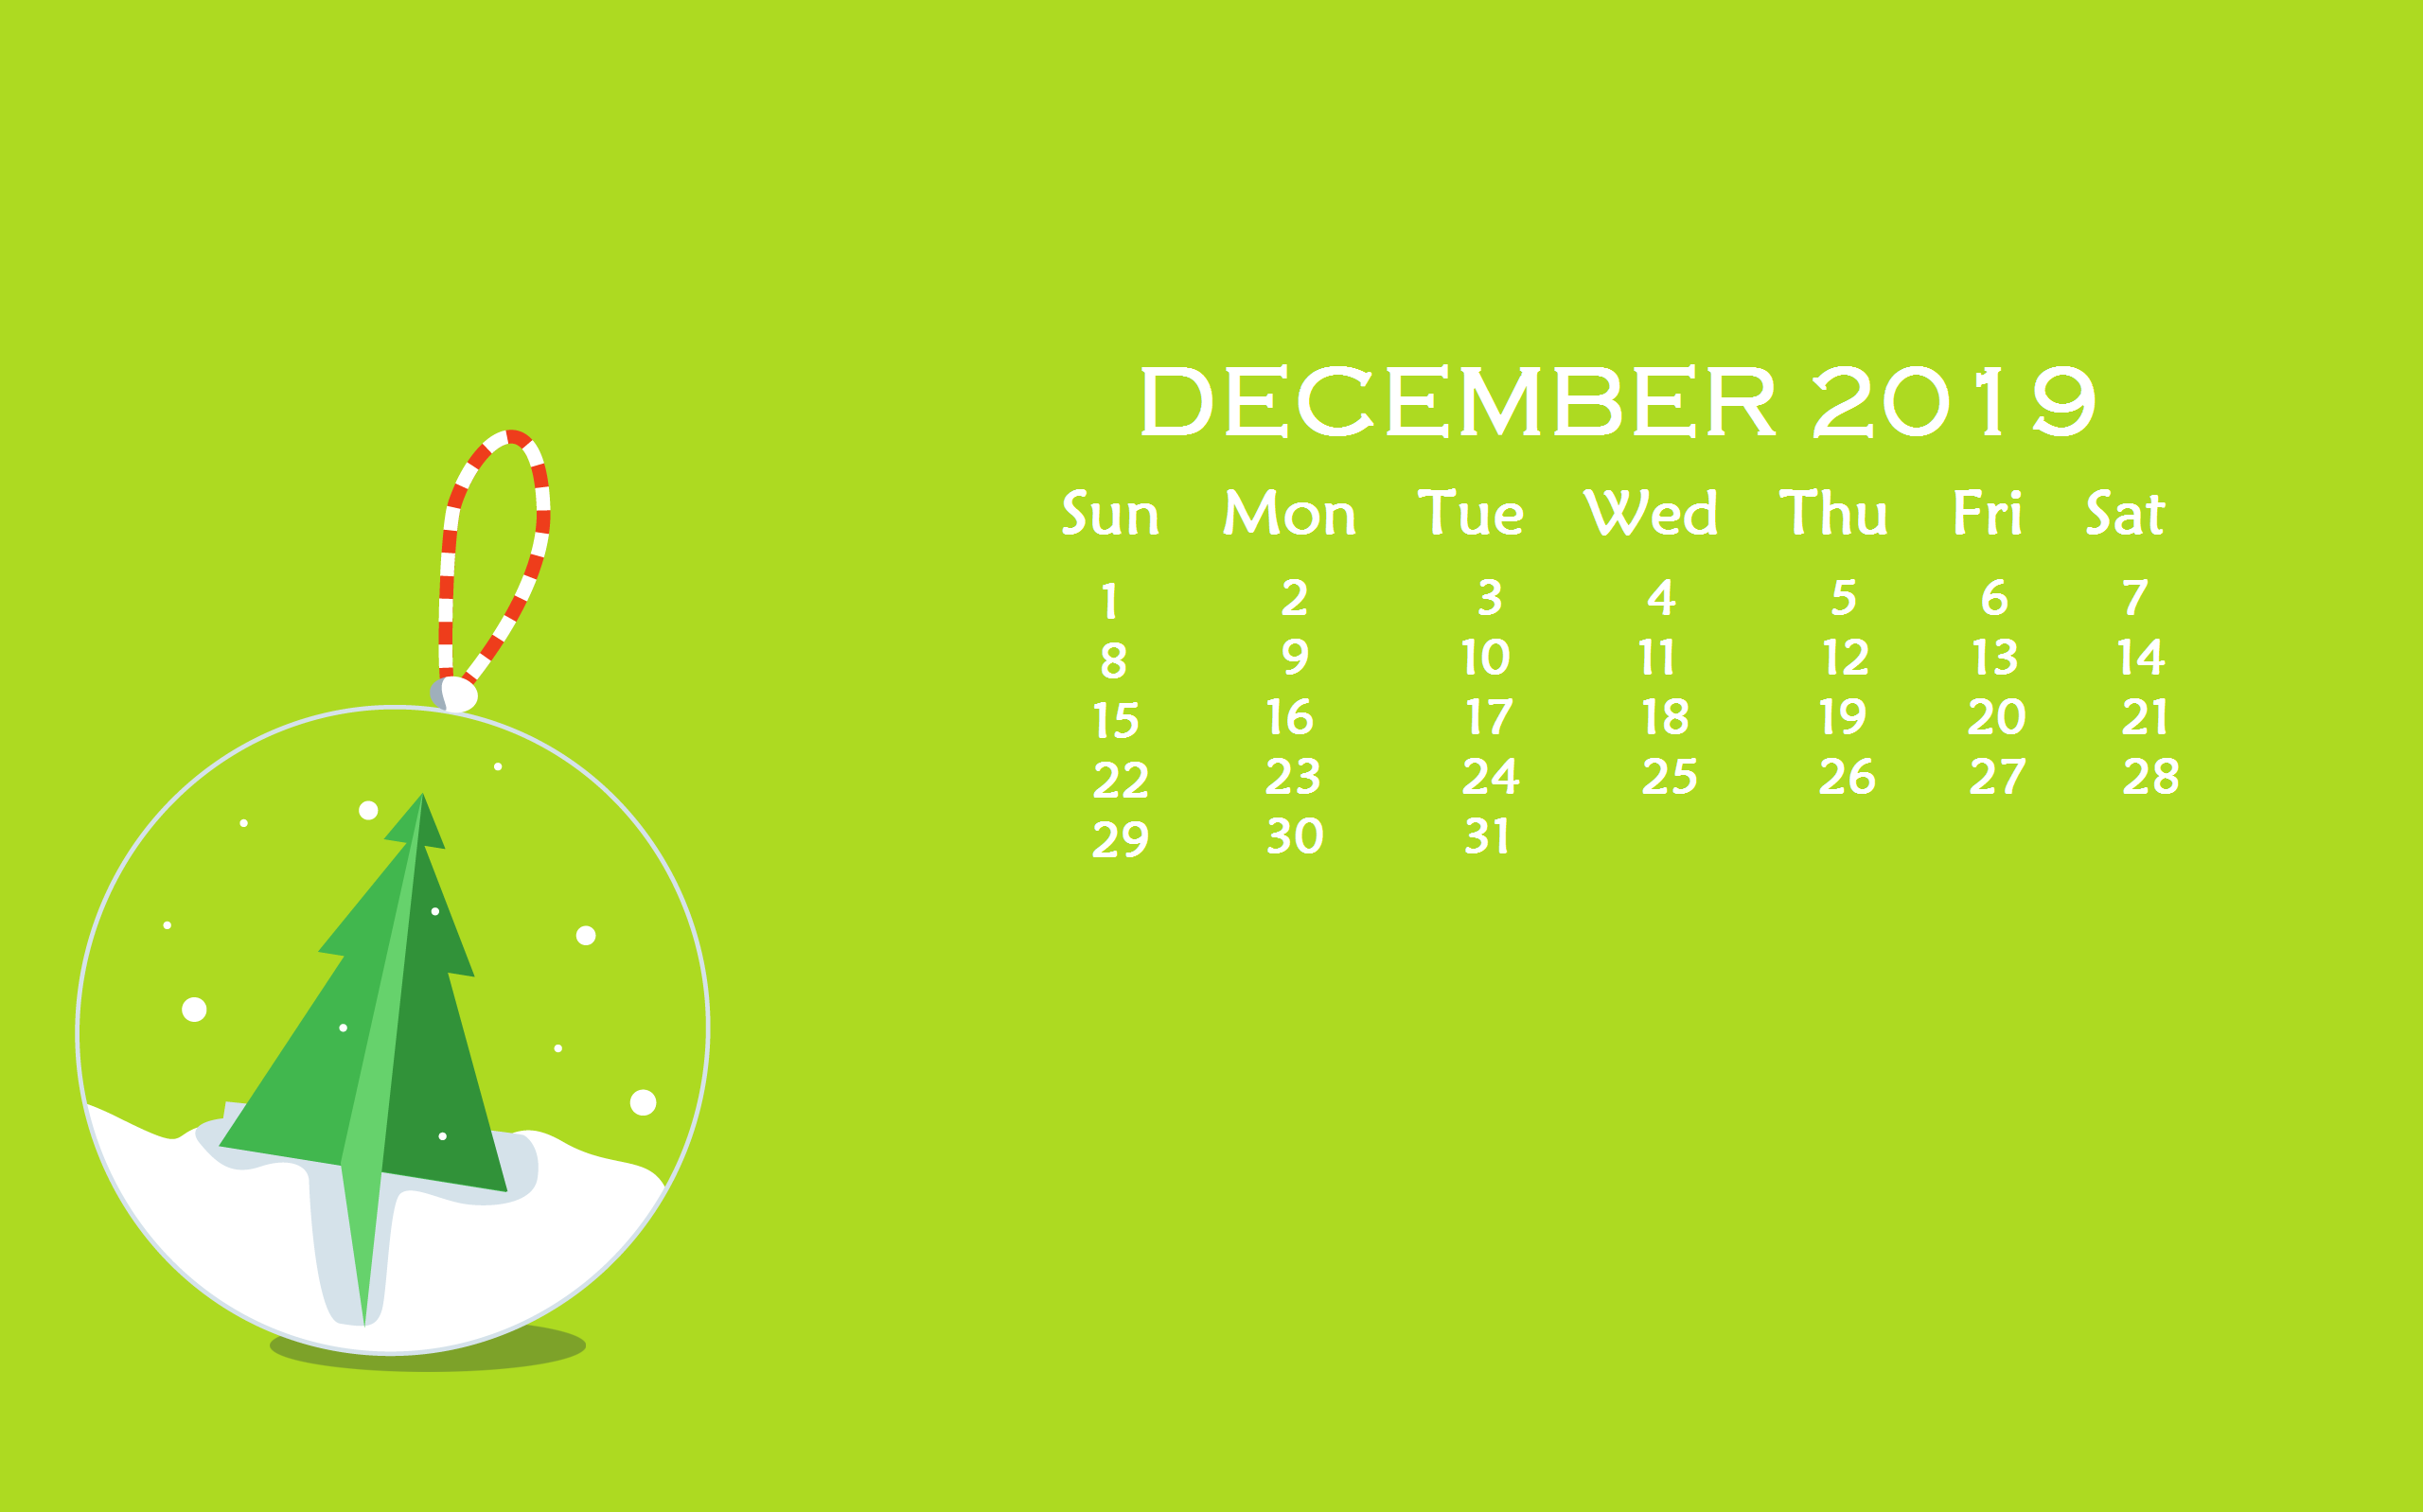 Christmas December 2019 Desktop Wallpaper - Desktop Wallpaper December 2019 , HD Wallpaper & Backgrounds